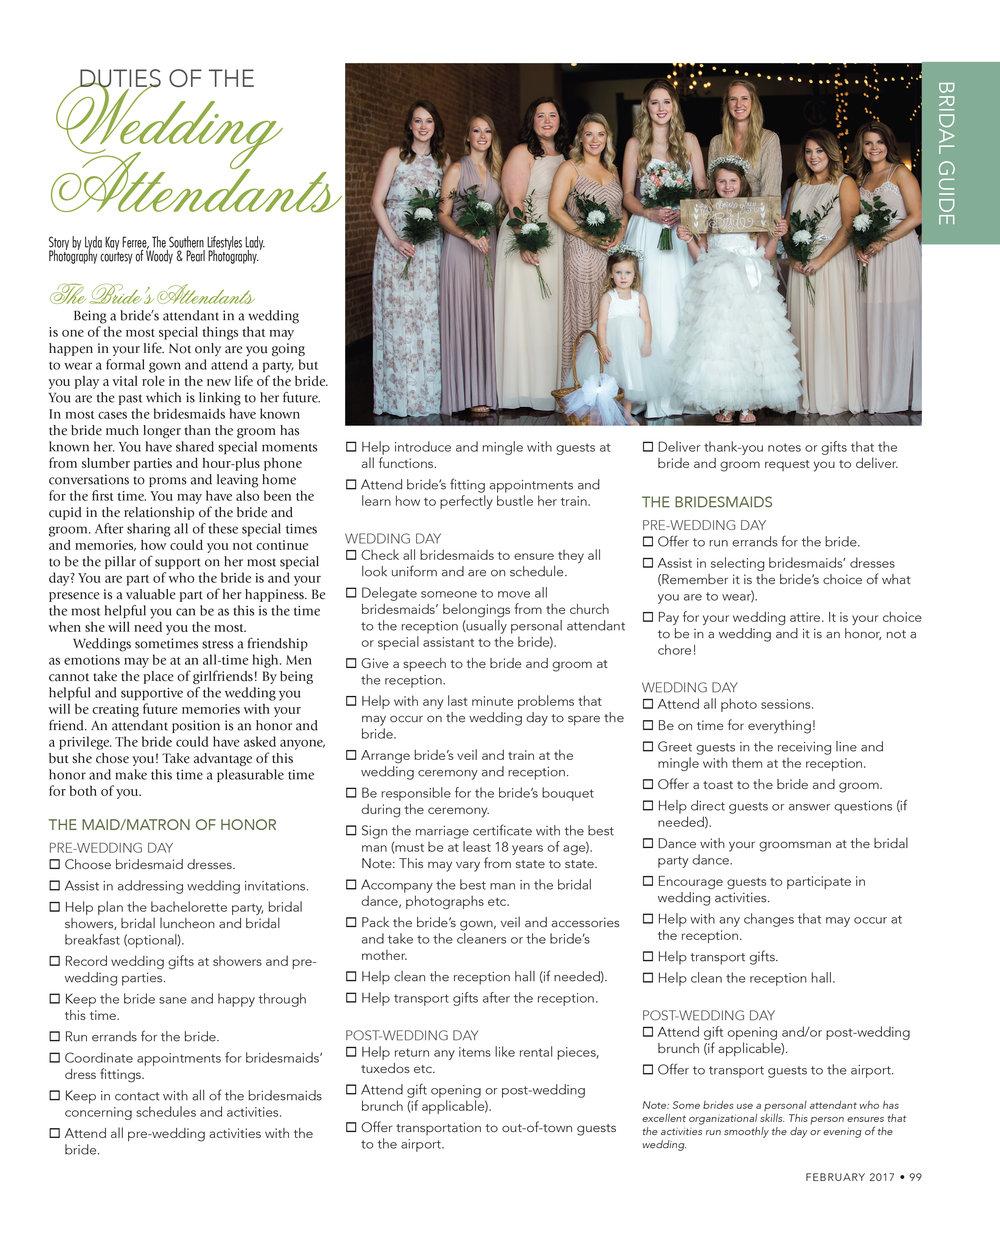 Download printable Wedding Attendants' Checklist here!